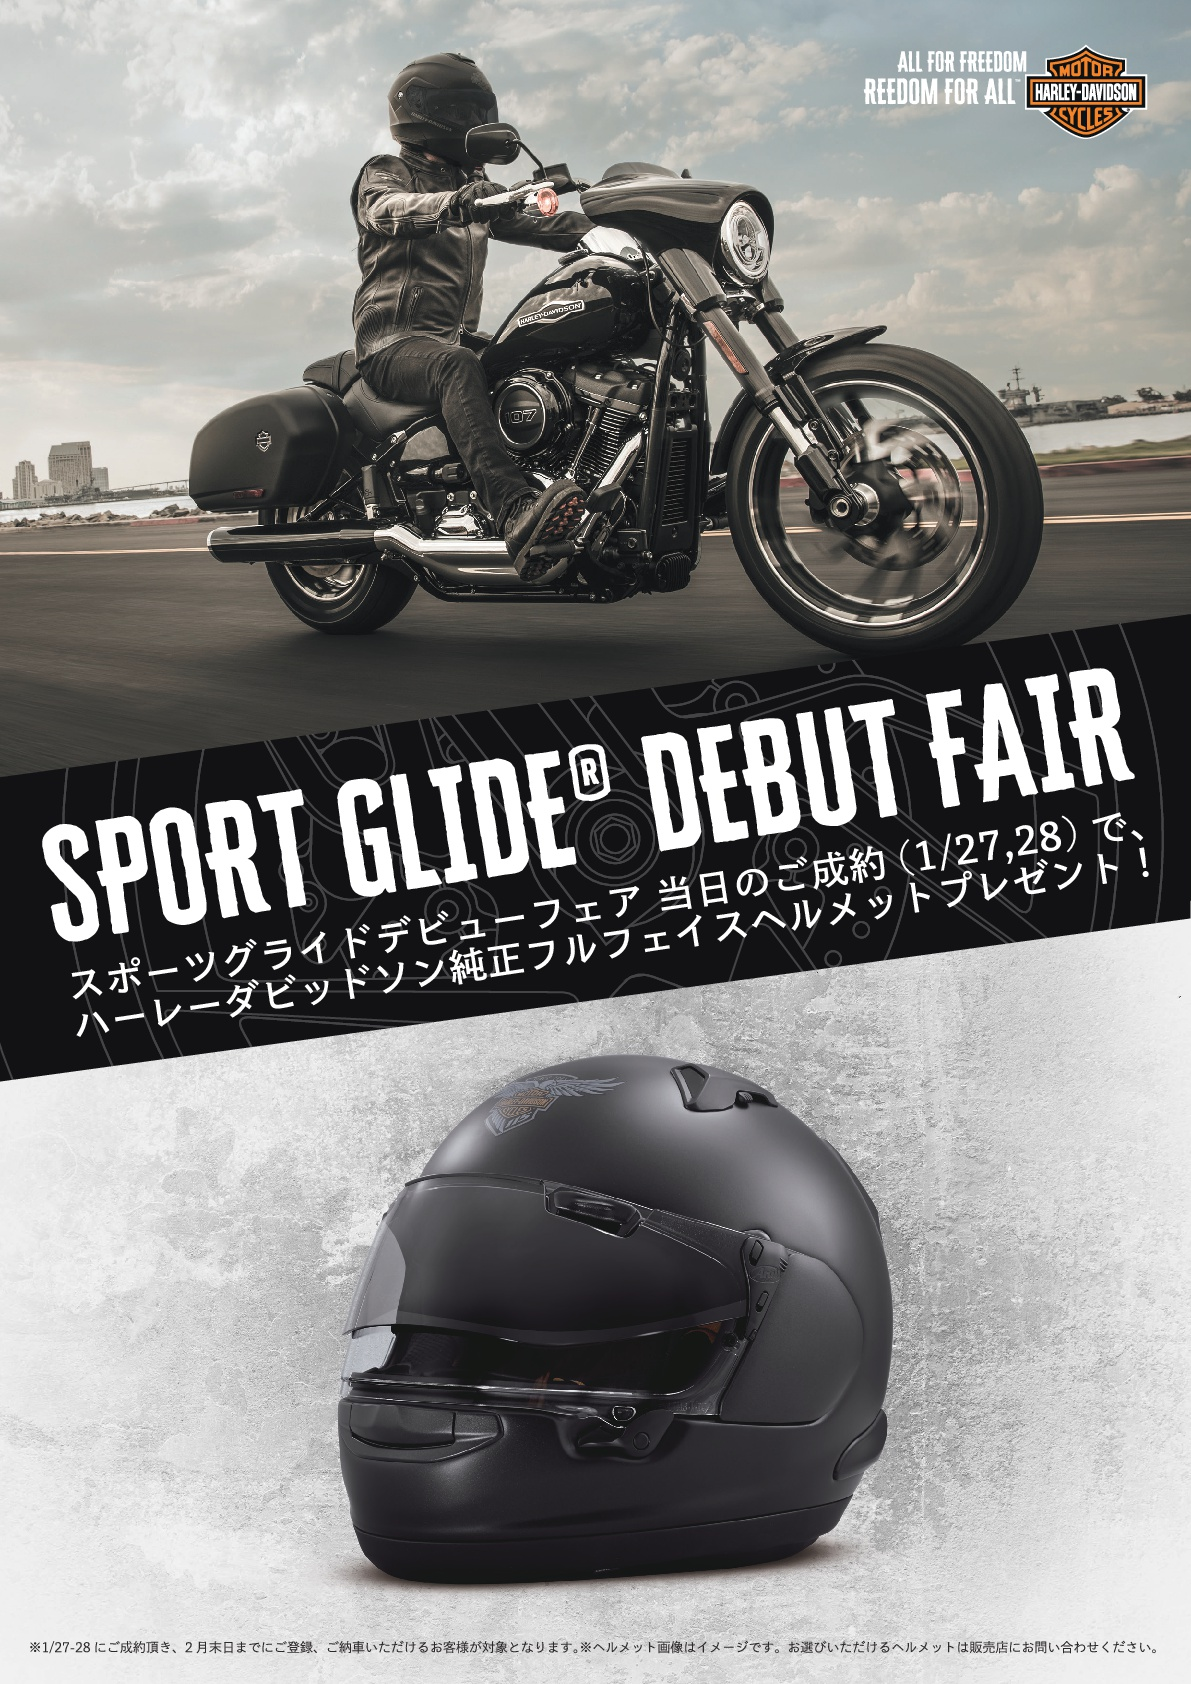 A4_Helmet_Poster-001.jpg